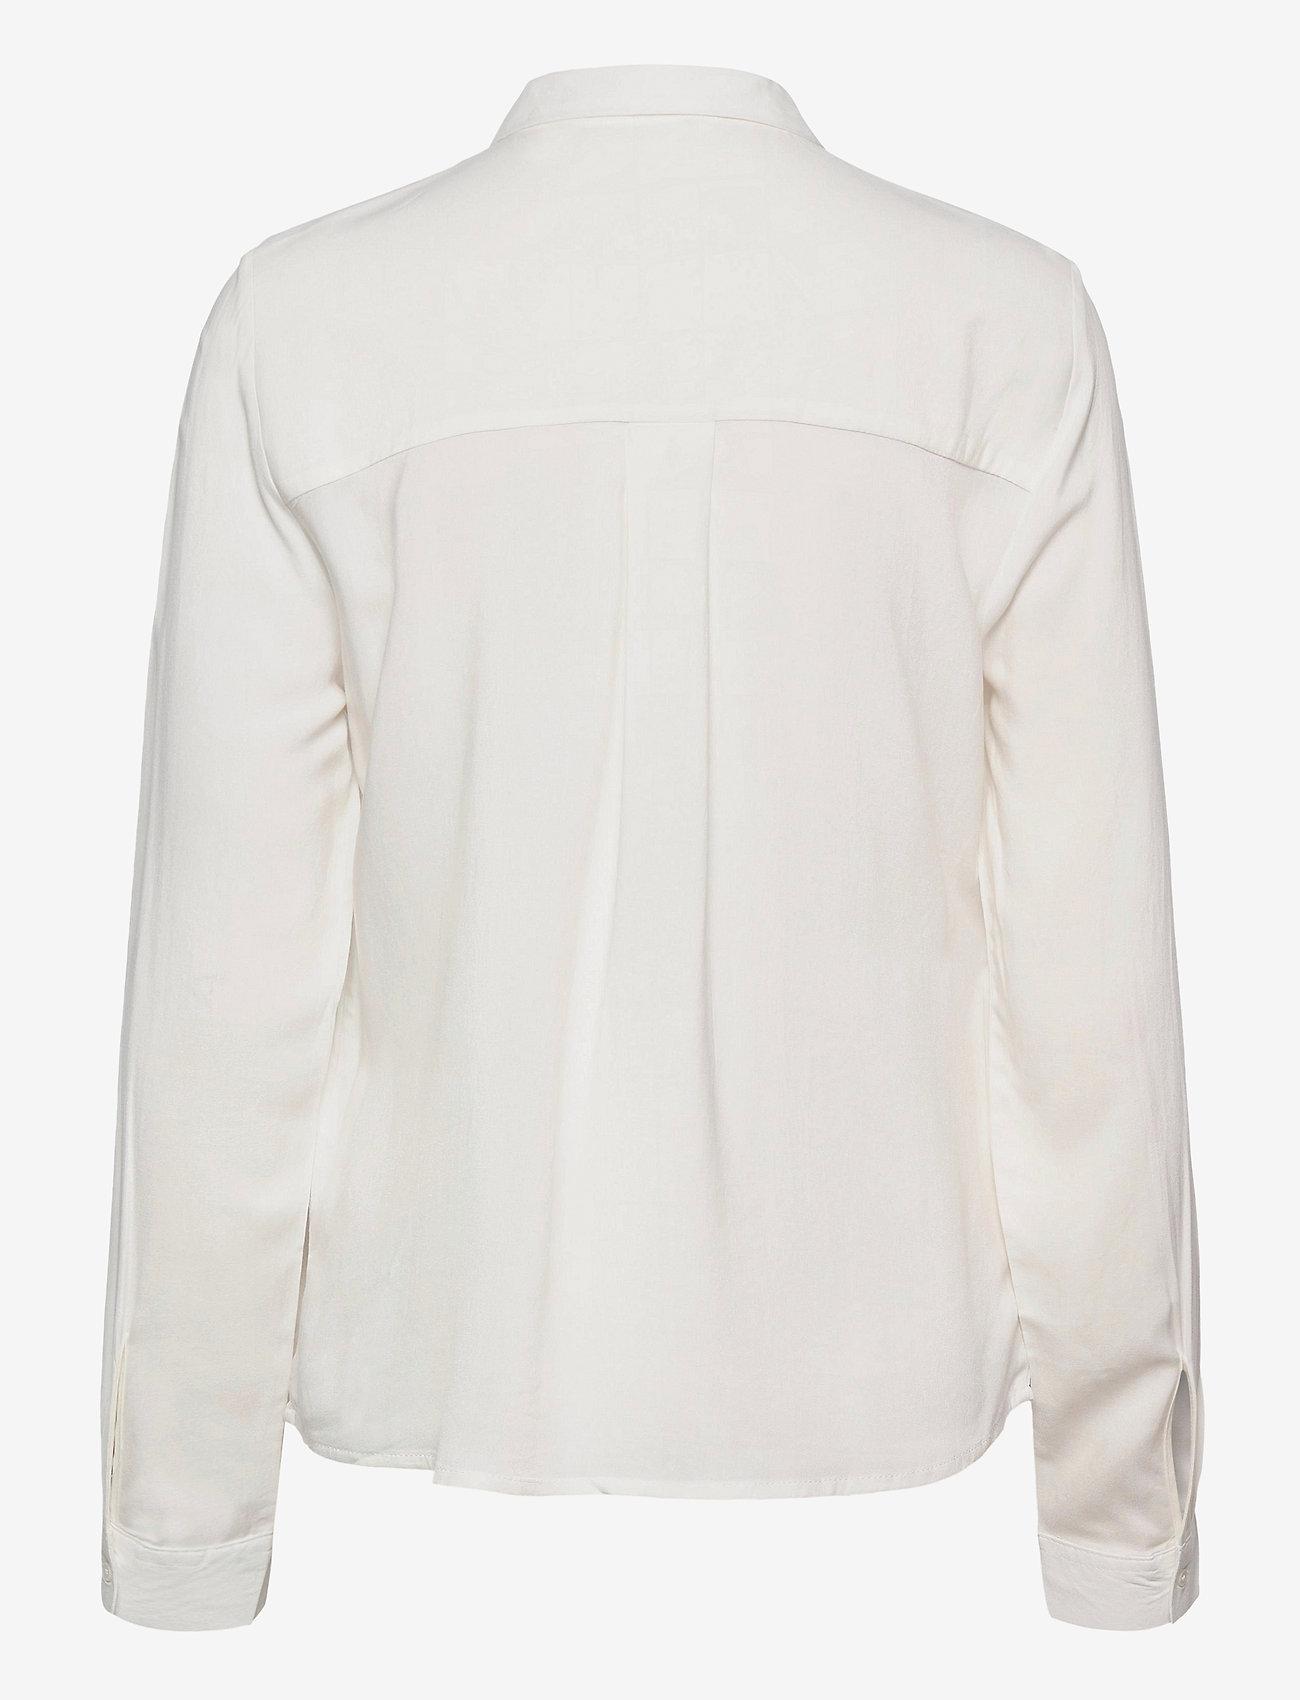 b.young - BYIDRA SHIRT - - long-sleeved shirts - off white - 1